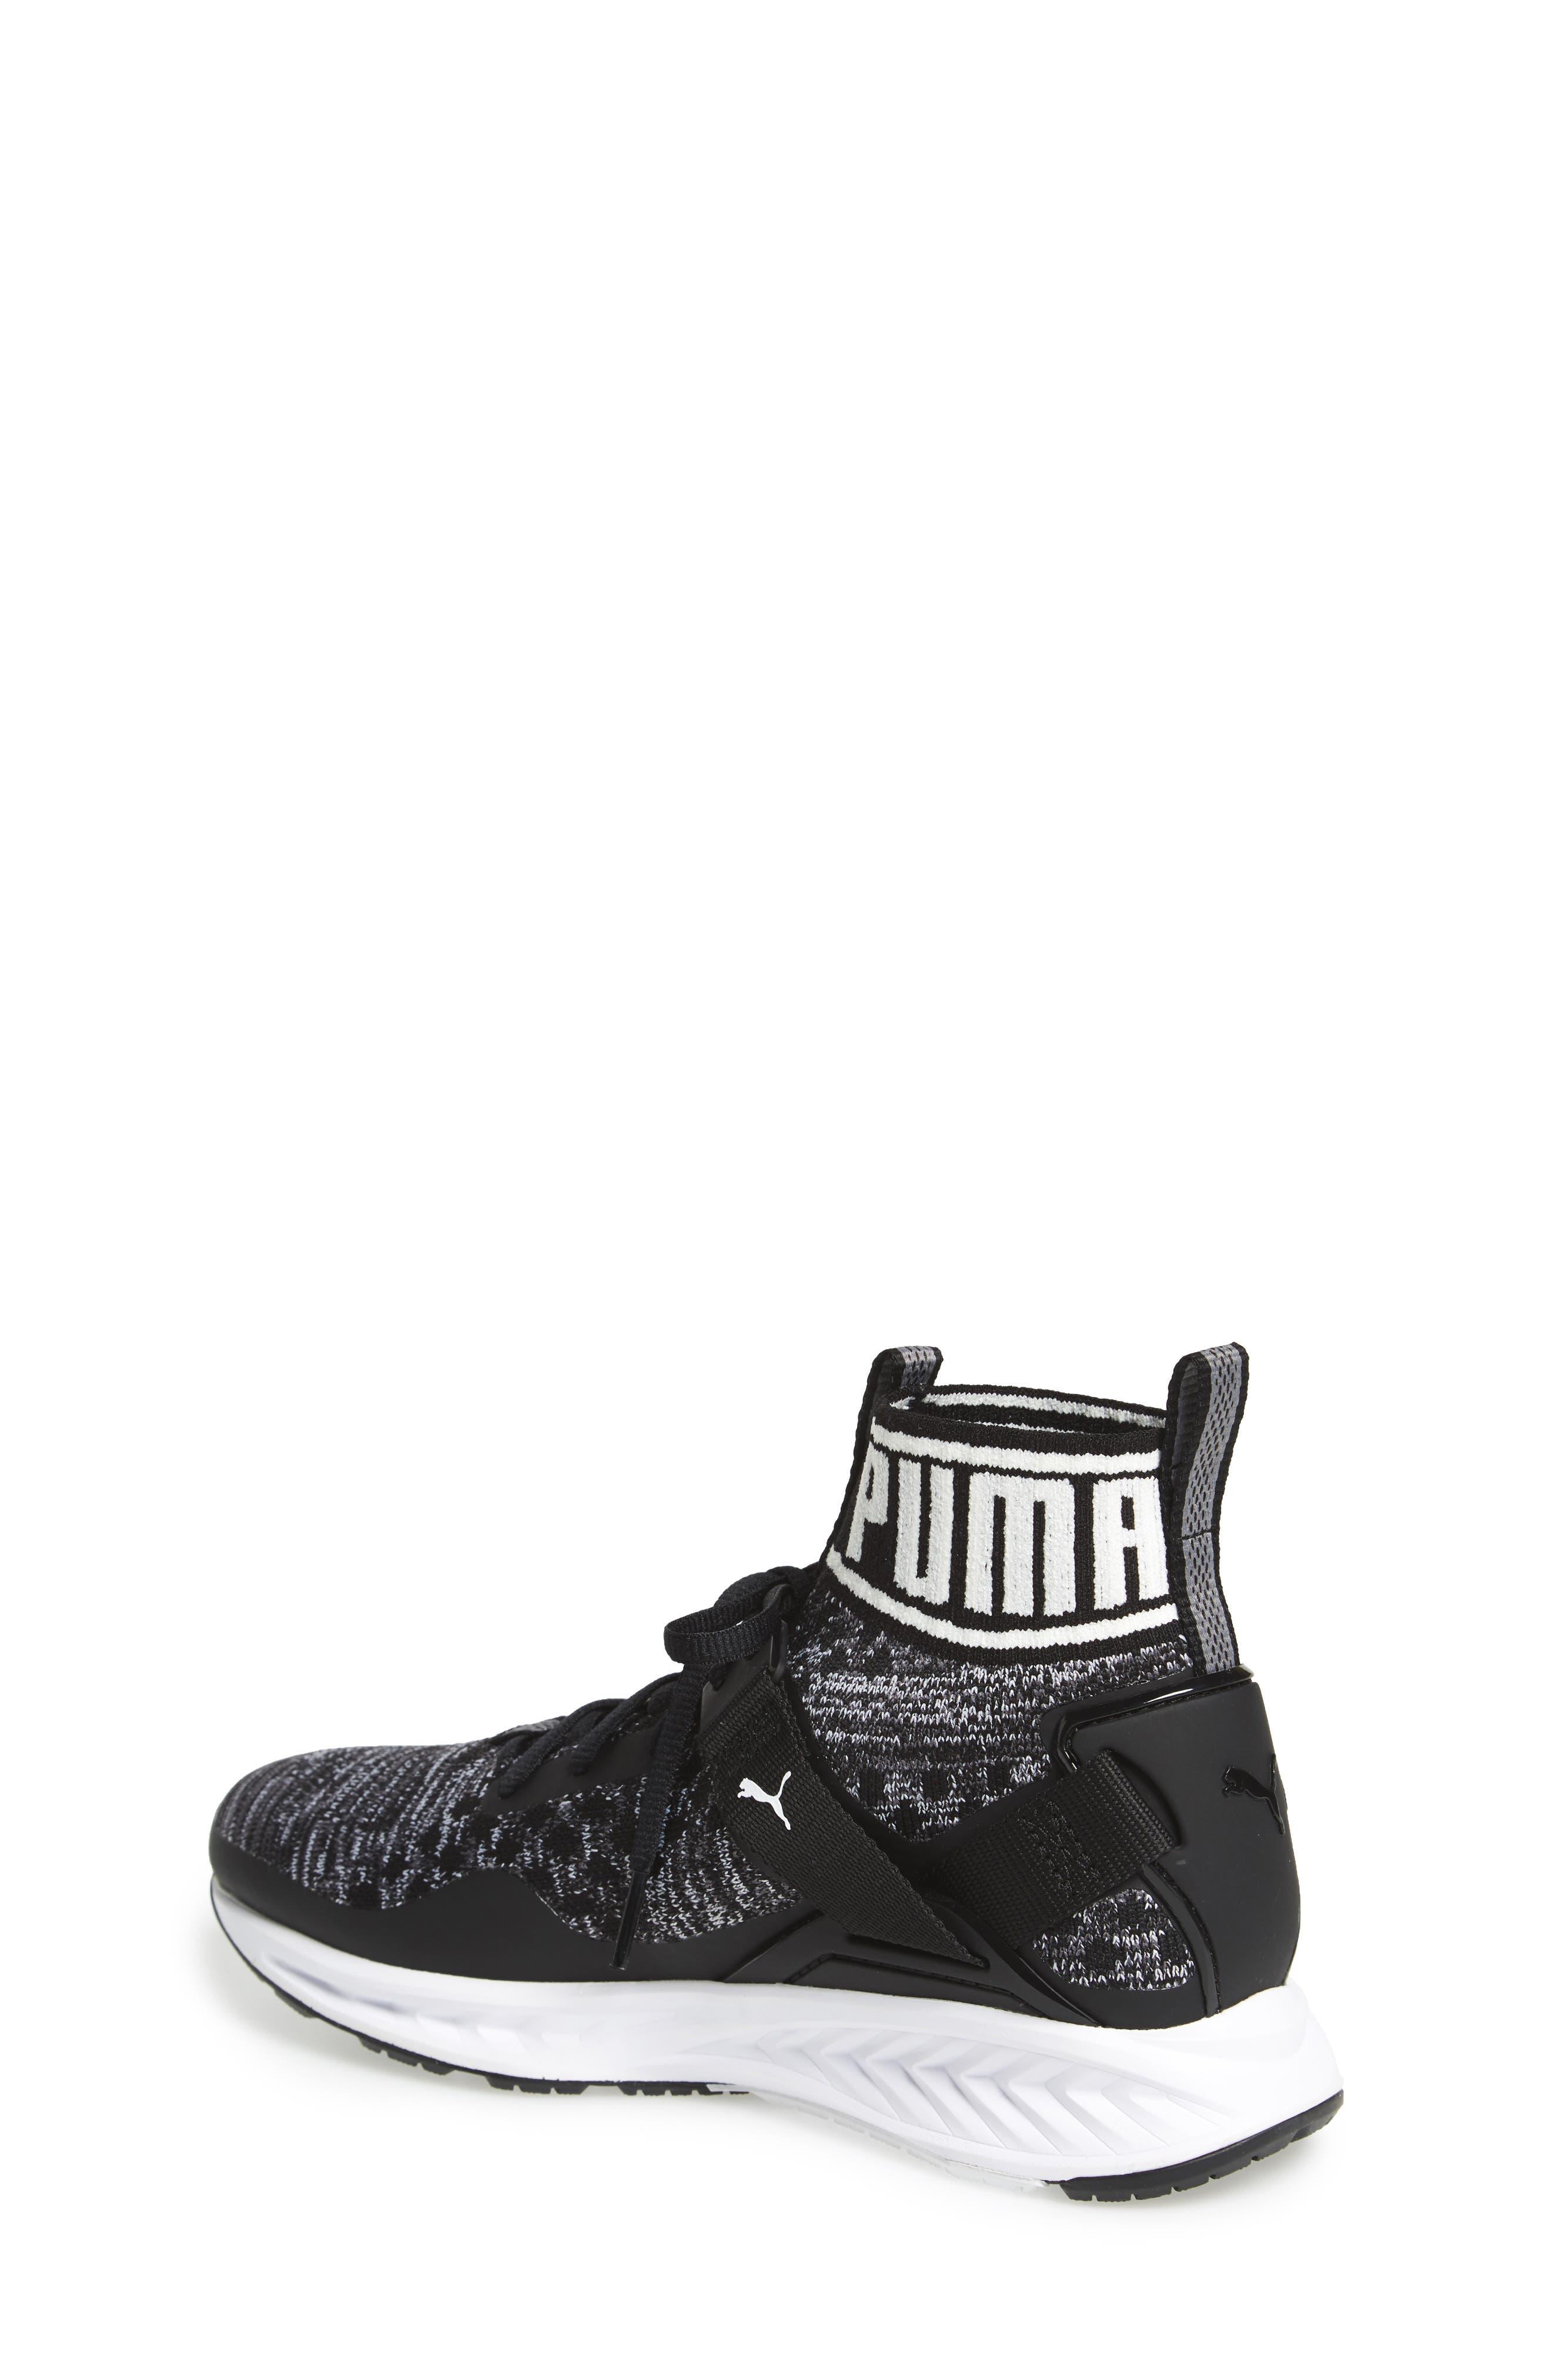 Ignite Evoknit Sneaker,                             Alternate thumbnail 2, color,                             001